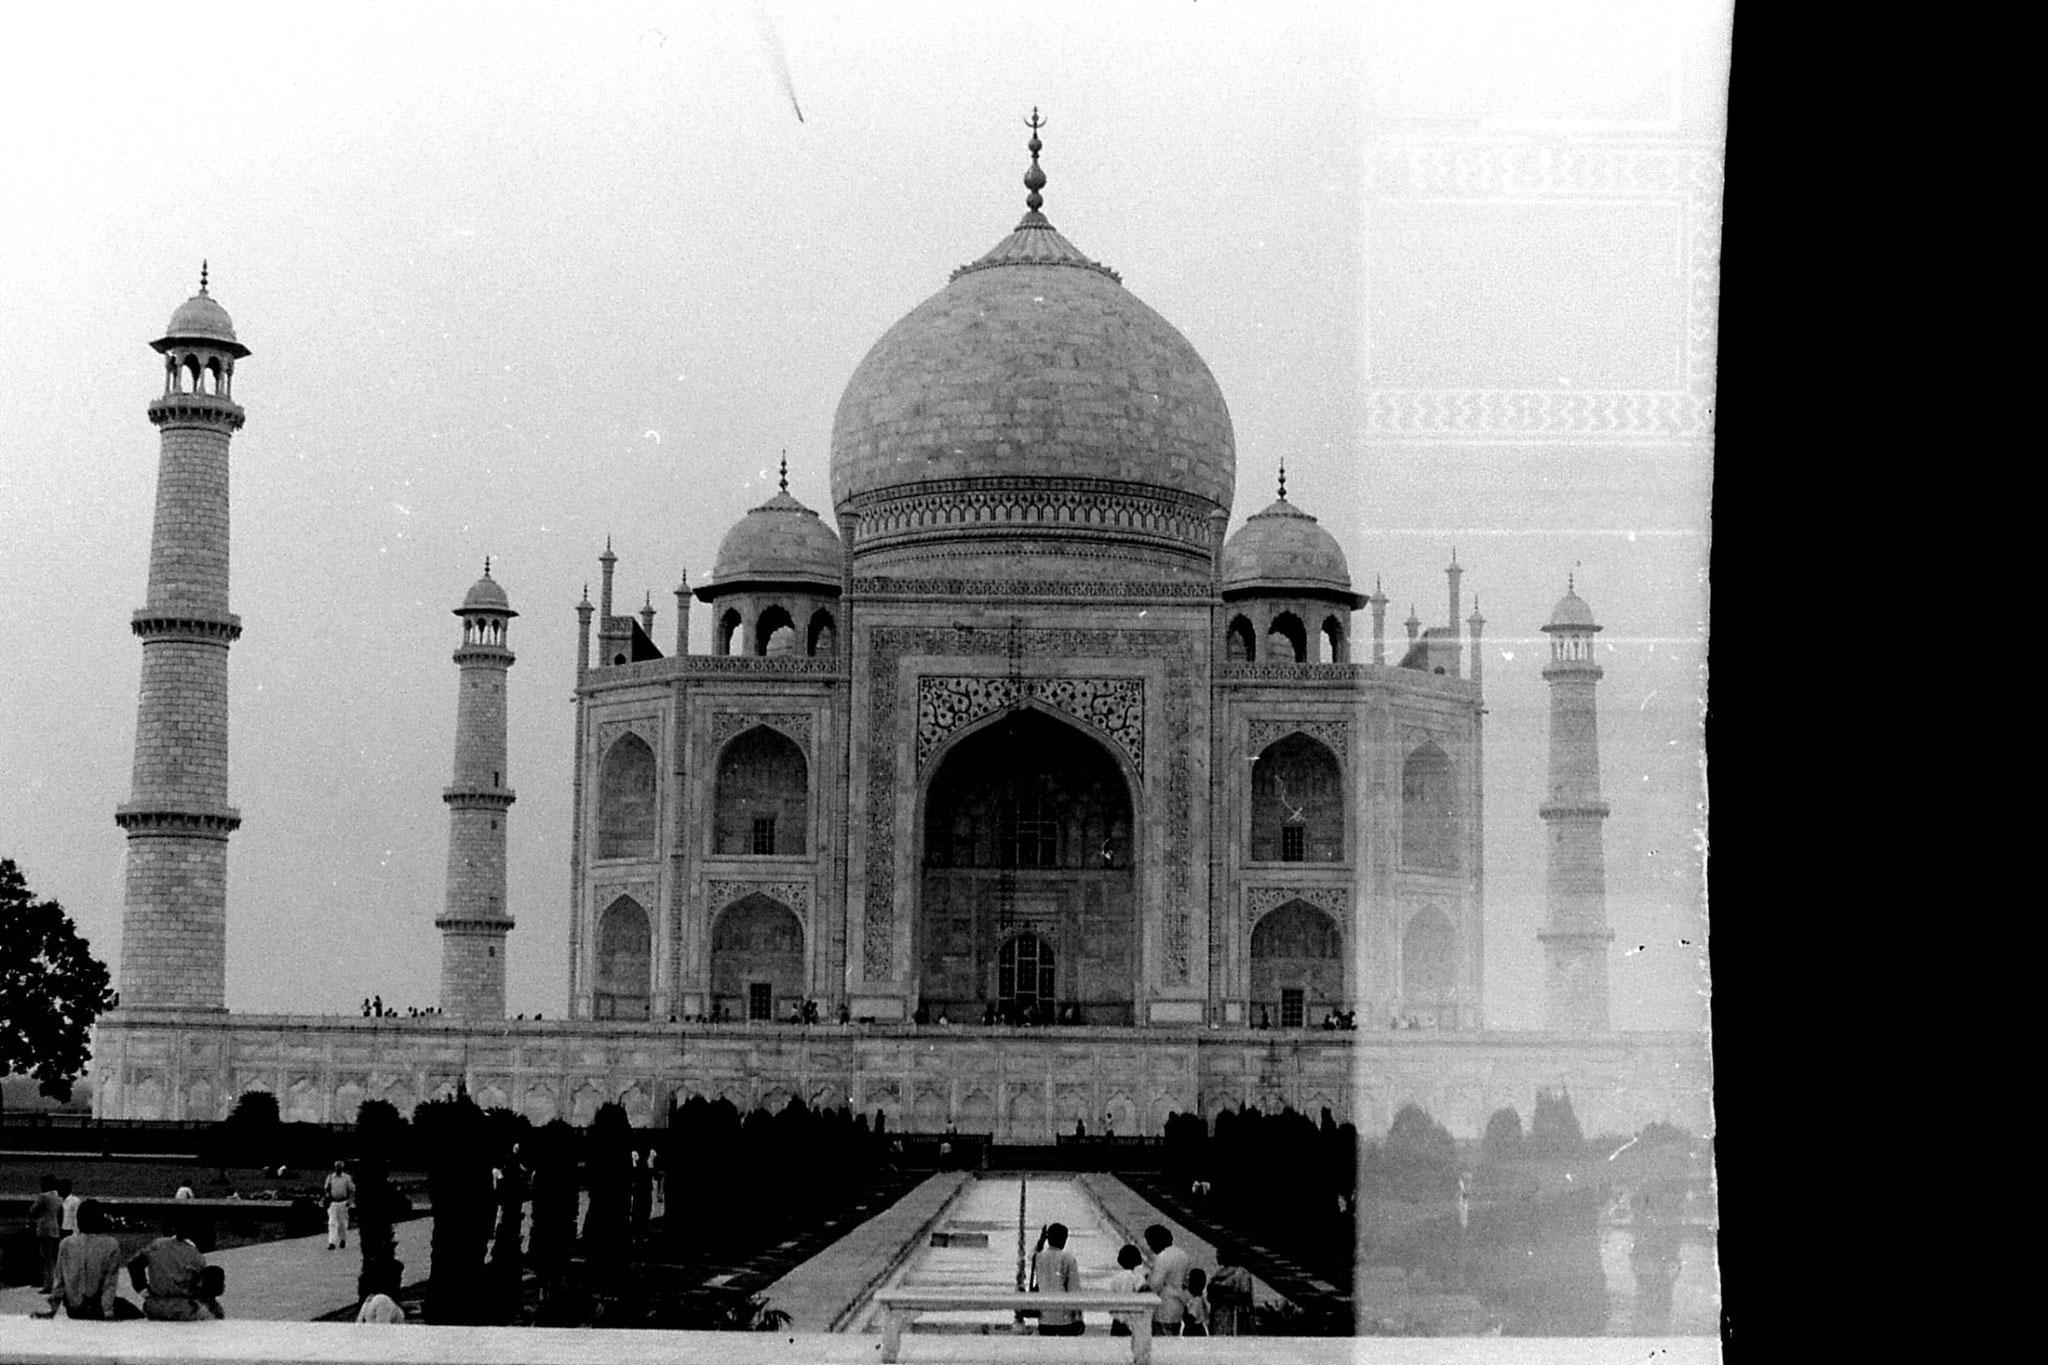 30/3/90: 32: Agra Taj Mahal